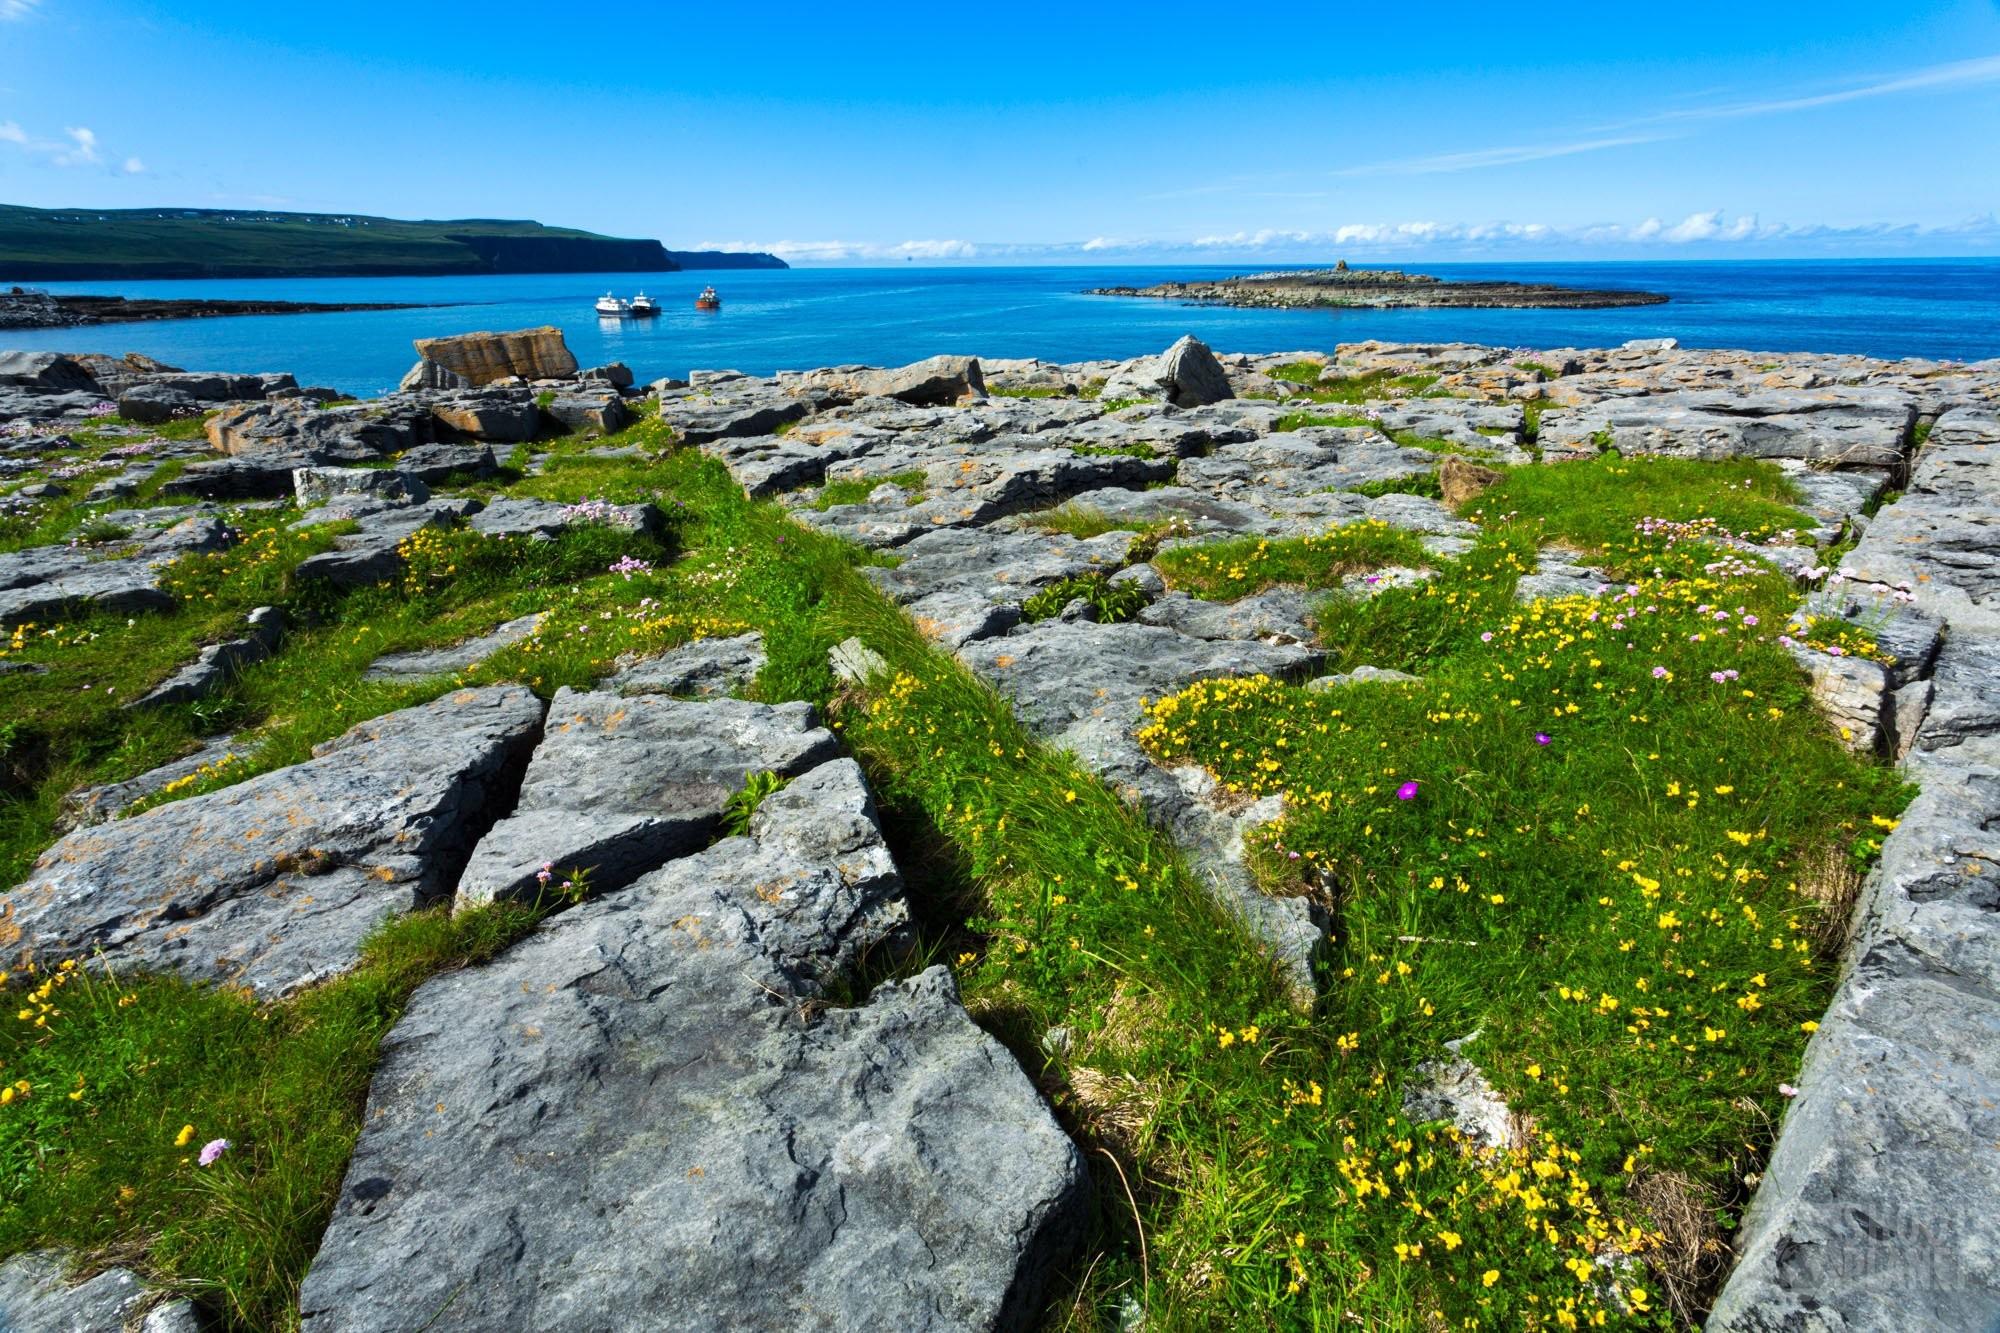 Cliffs of Moher wildflowers rocks, Ireland